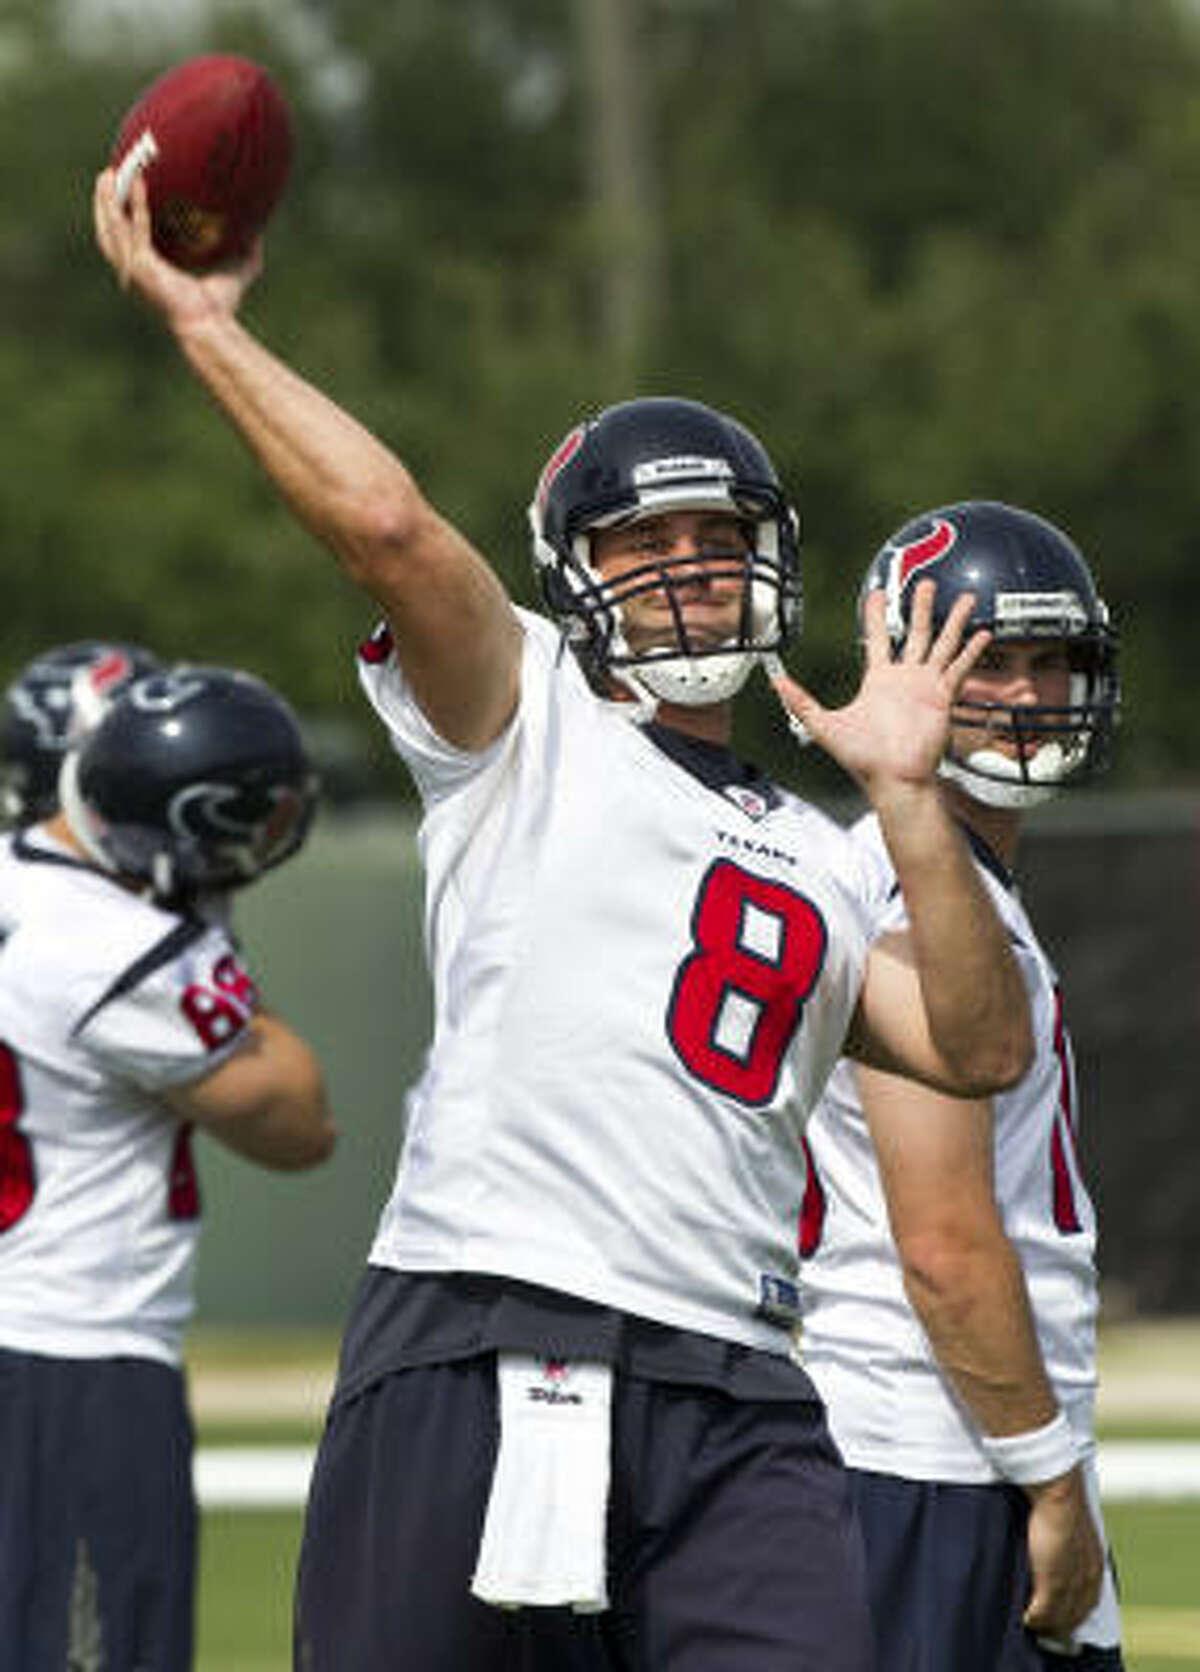 Texans quarterback Matt Schaub throws a pass during Tuesday's organized team activities. Schaub is coming off a career-high 4,770 yards and 29 touchdowns last season.